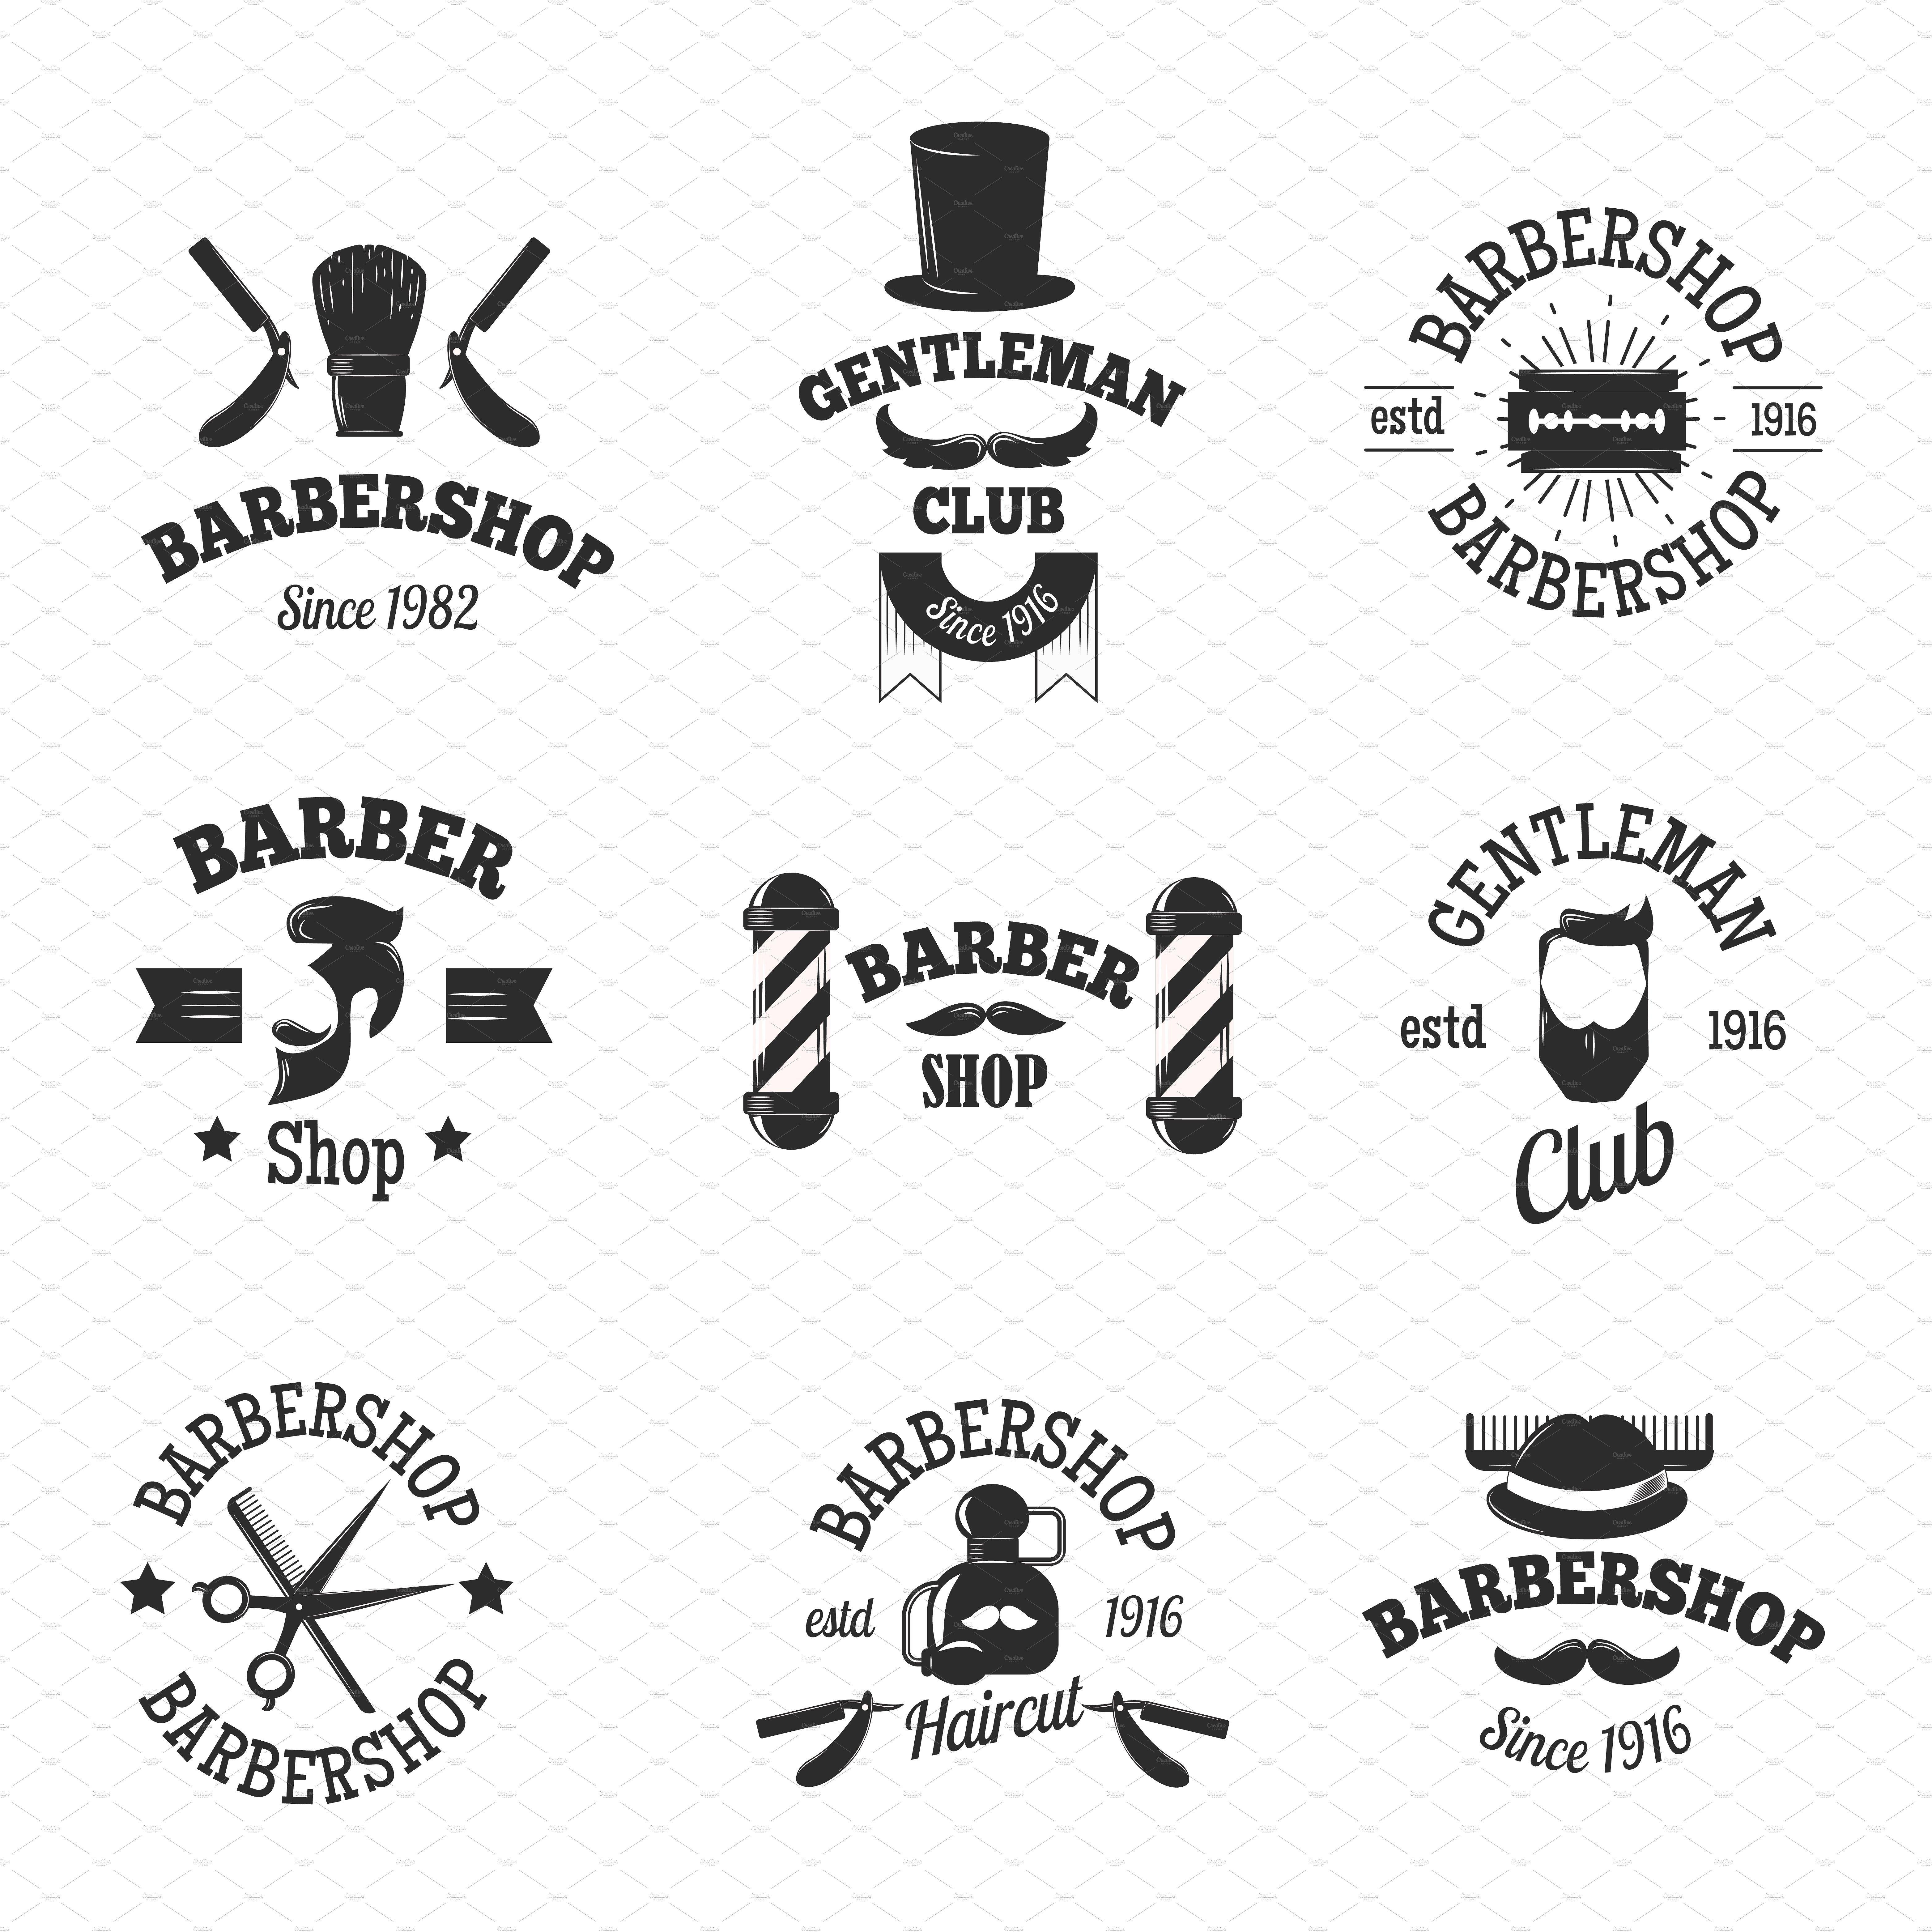 Barbershop icons logos cliparts clip transparent download Barber shops symbols vector set by Vectorstockerland on ... clip transparent download